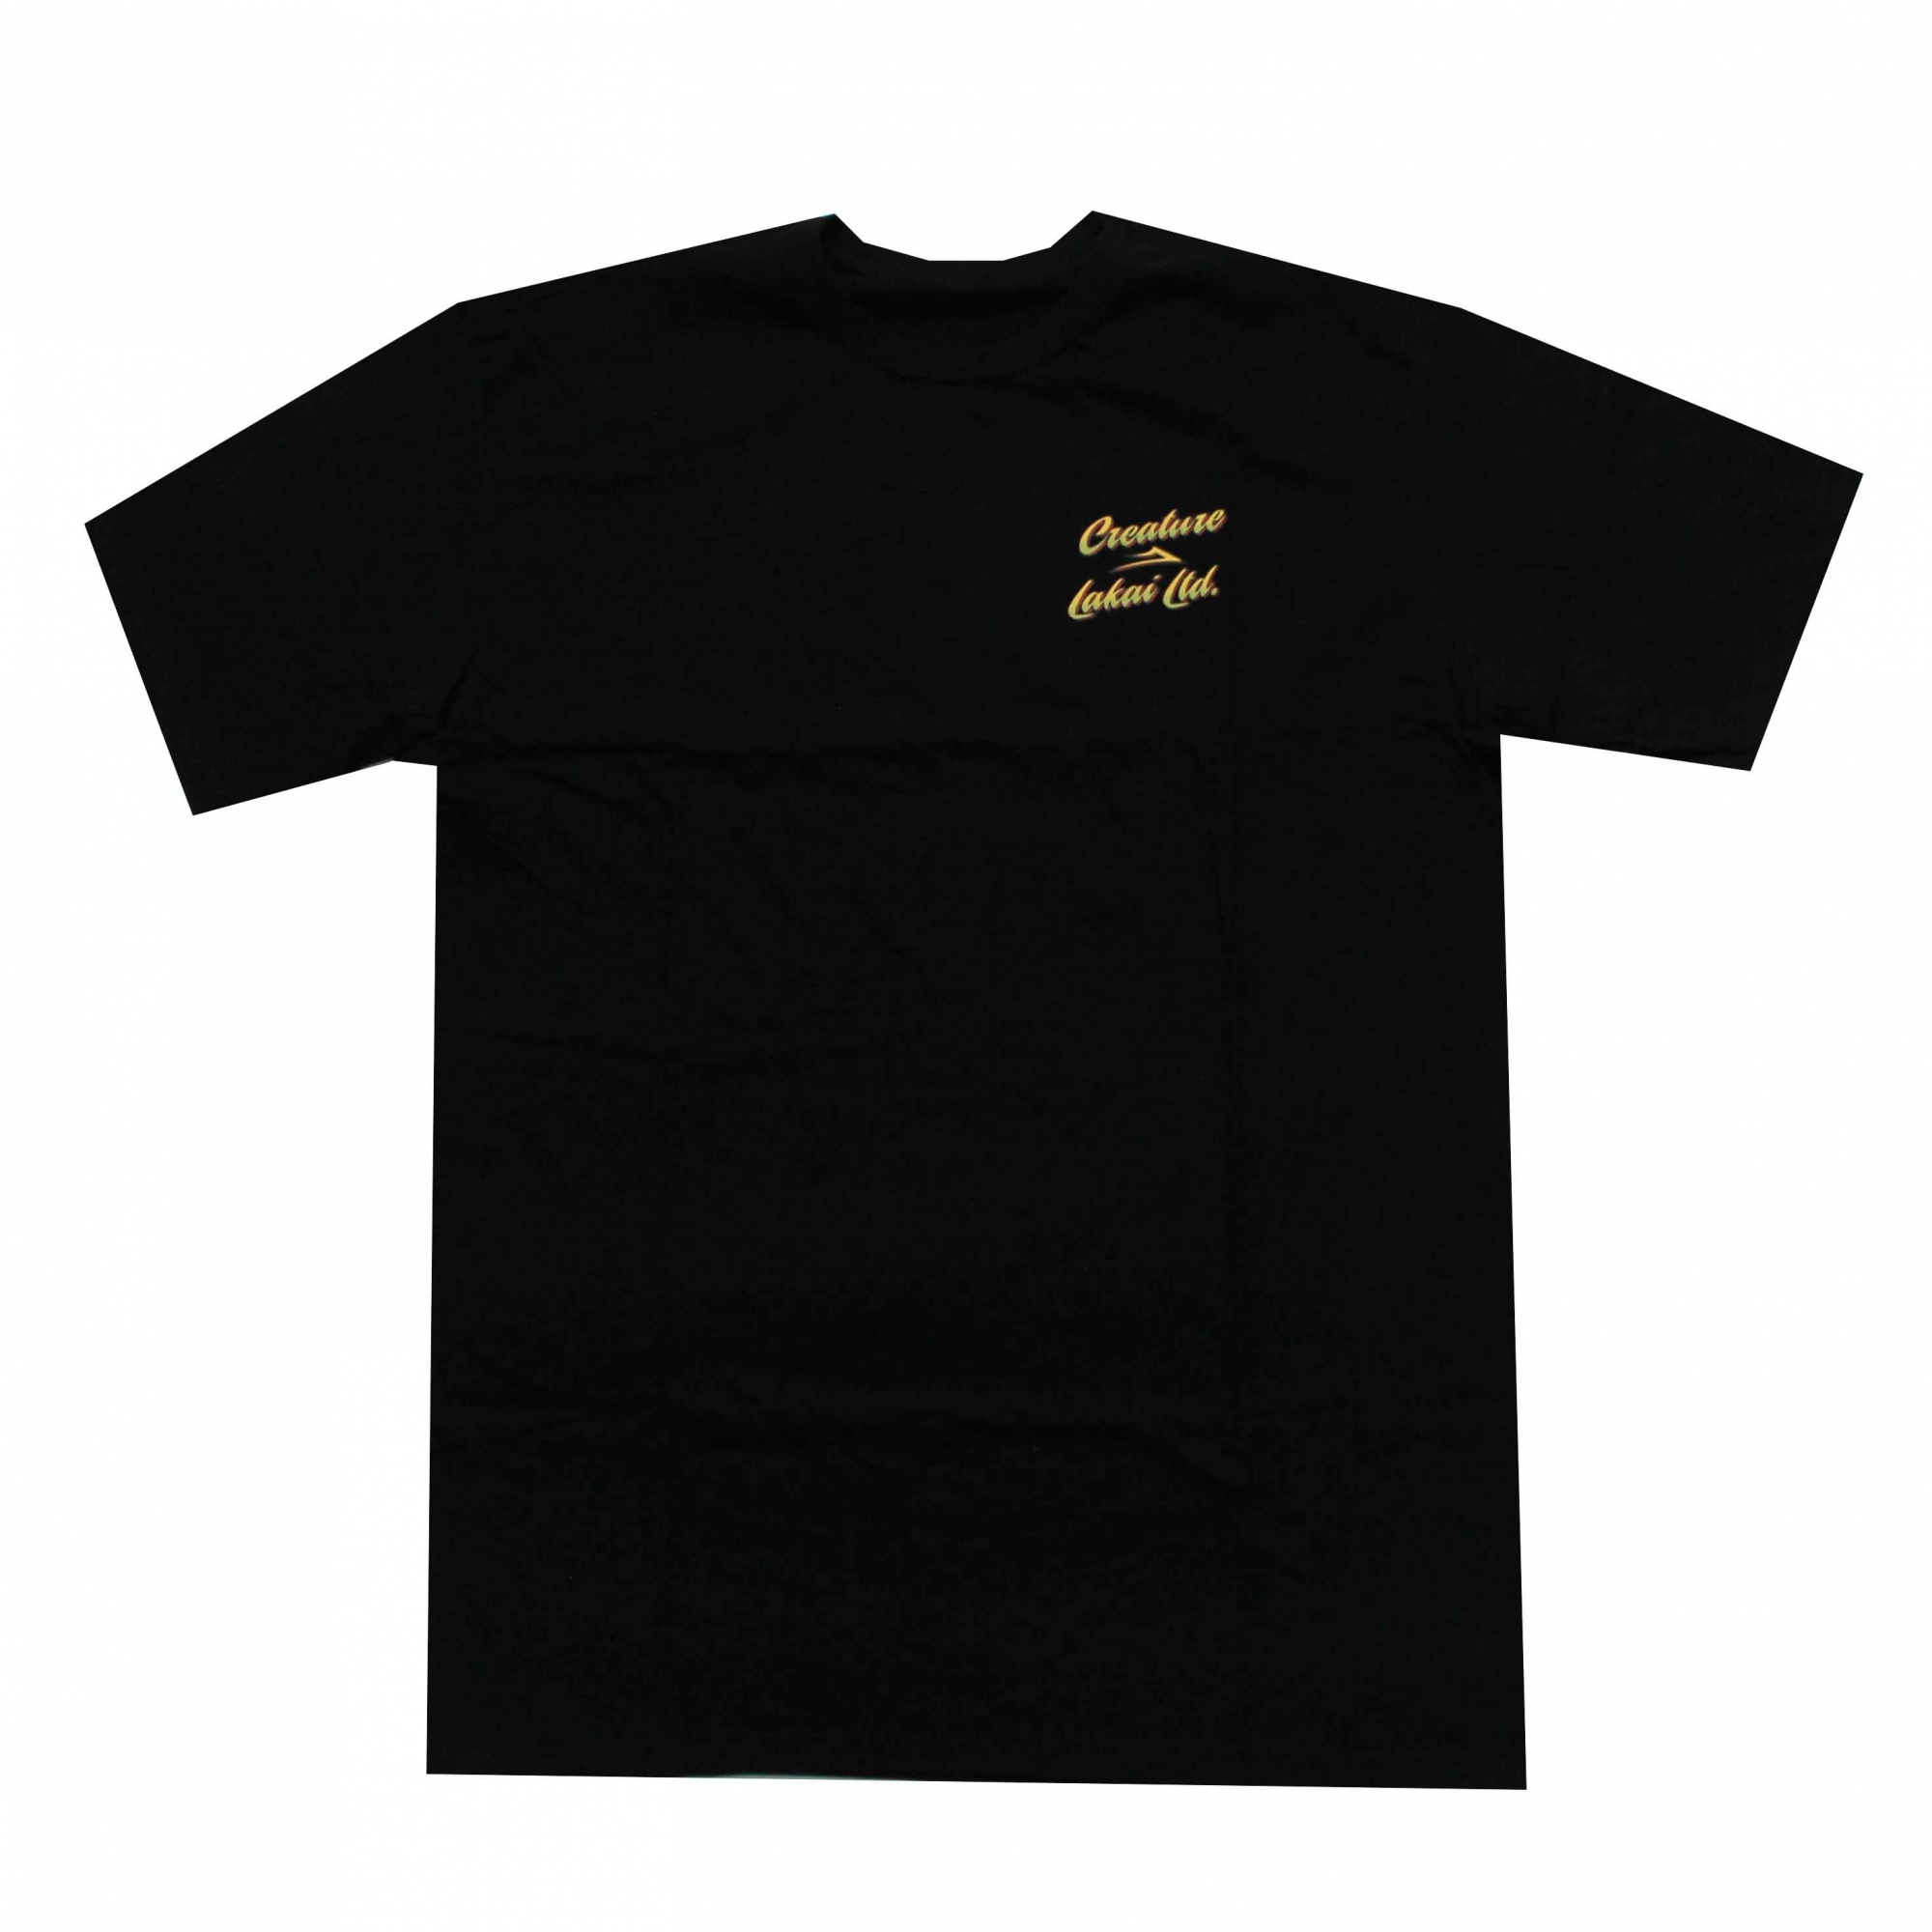 Camiseta Lakai x Creature Kali - Preto (Limitada)